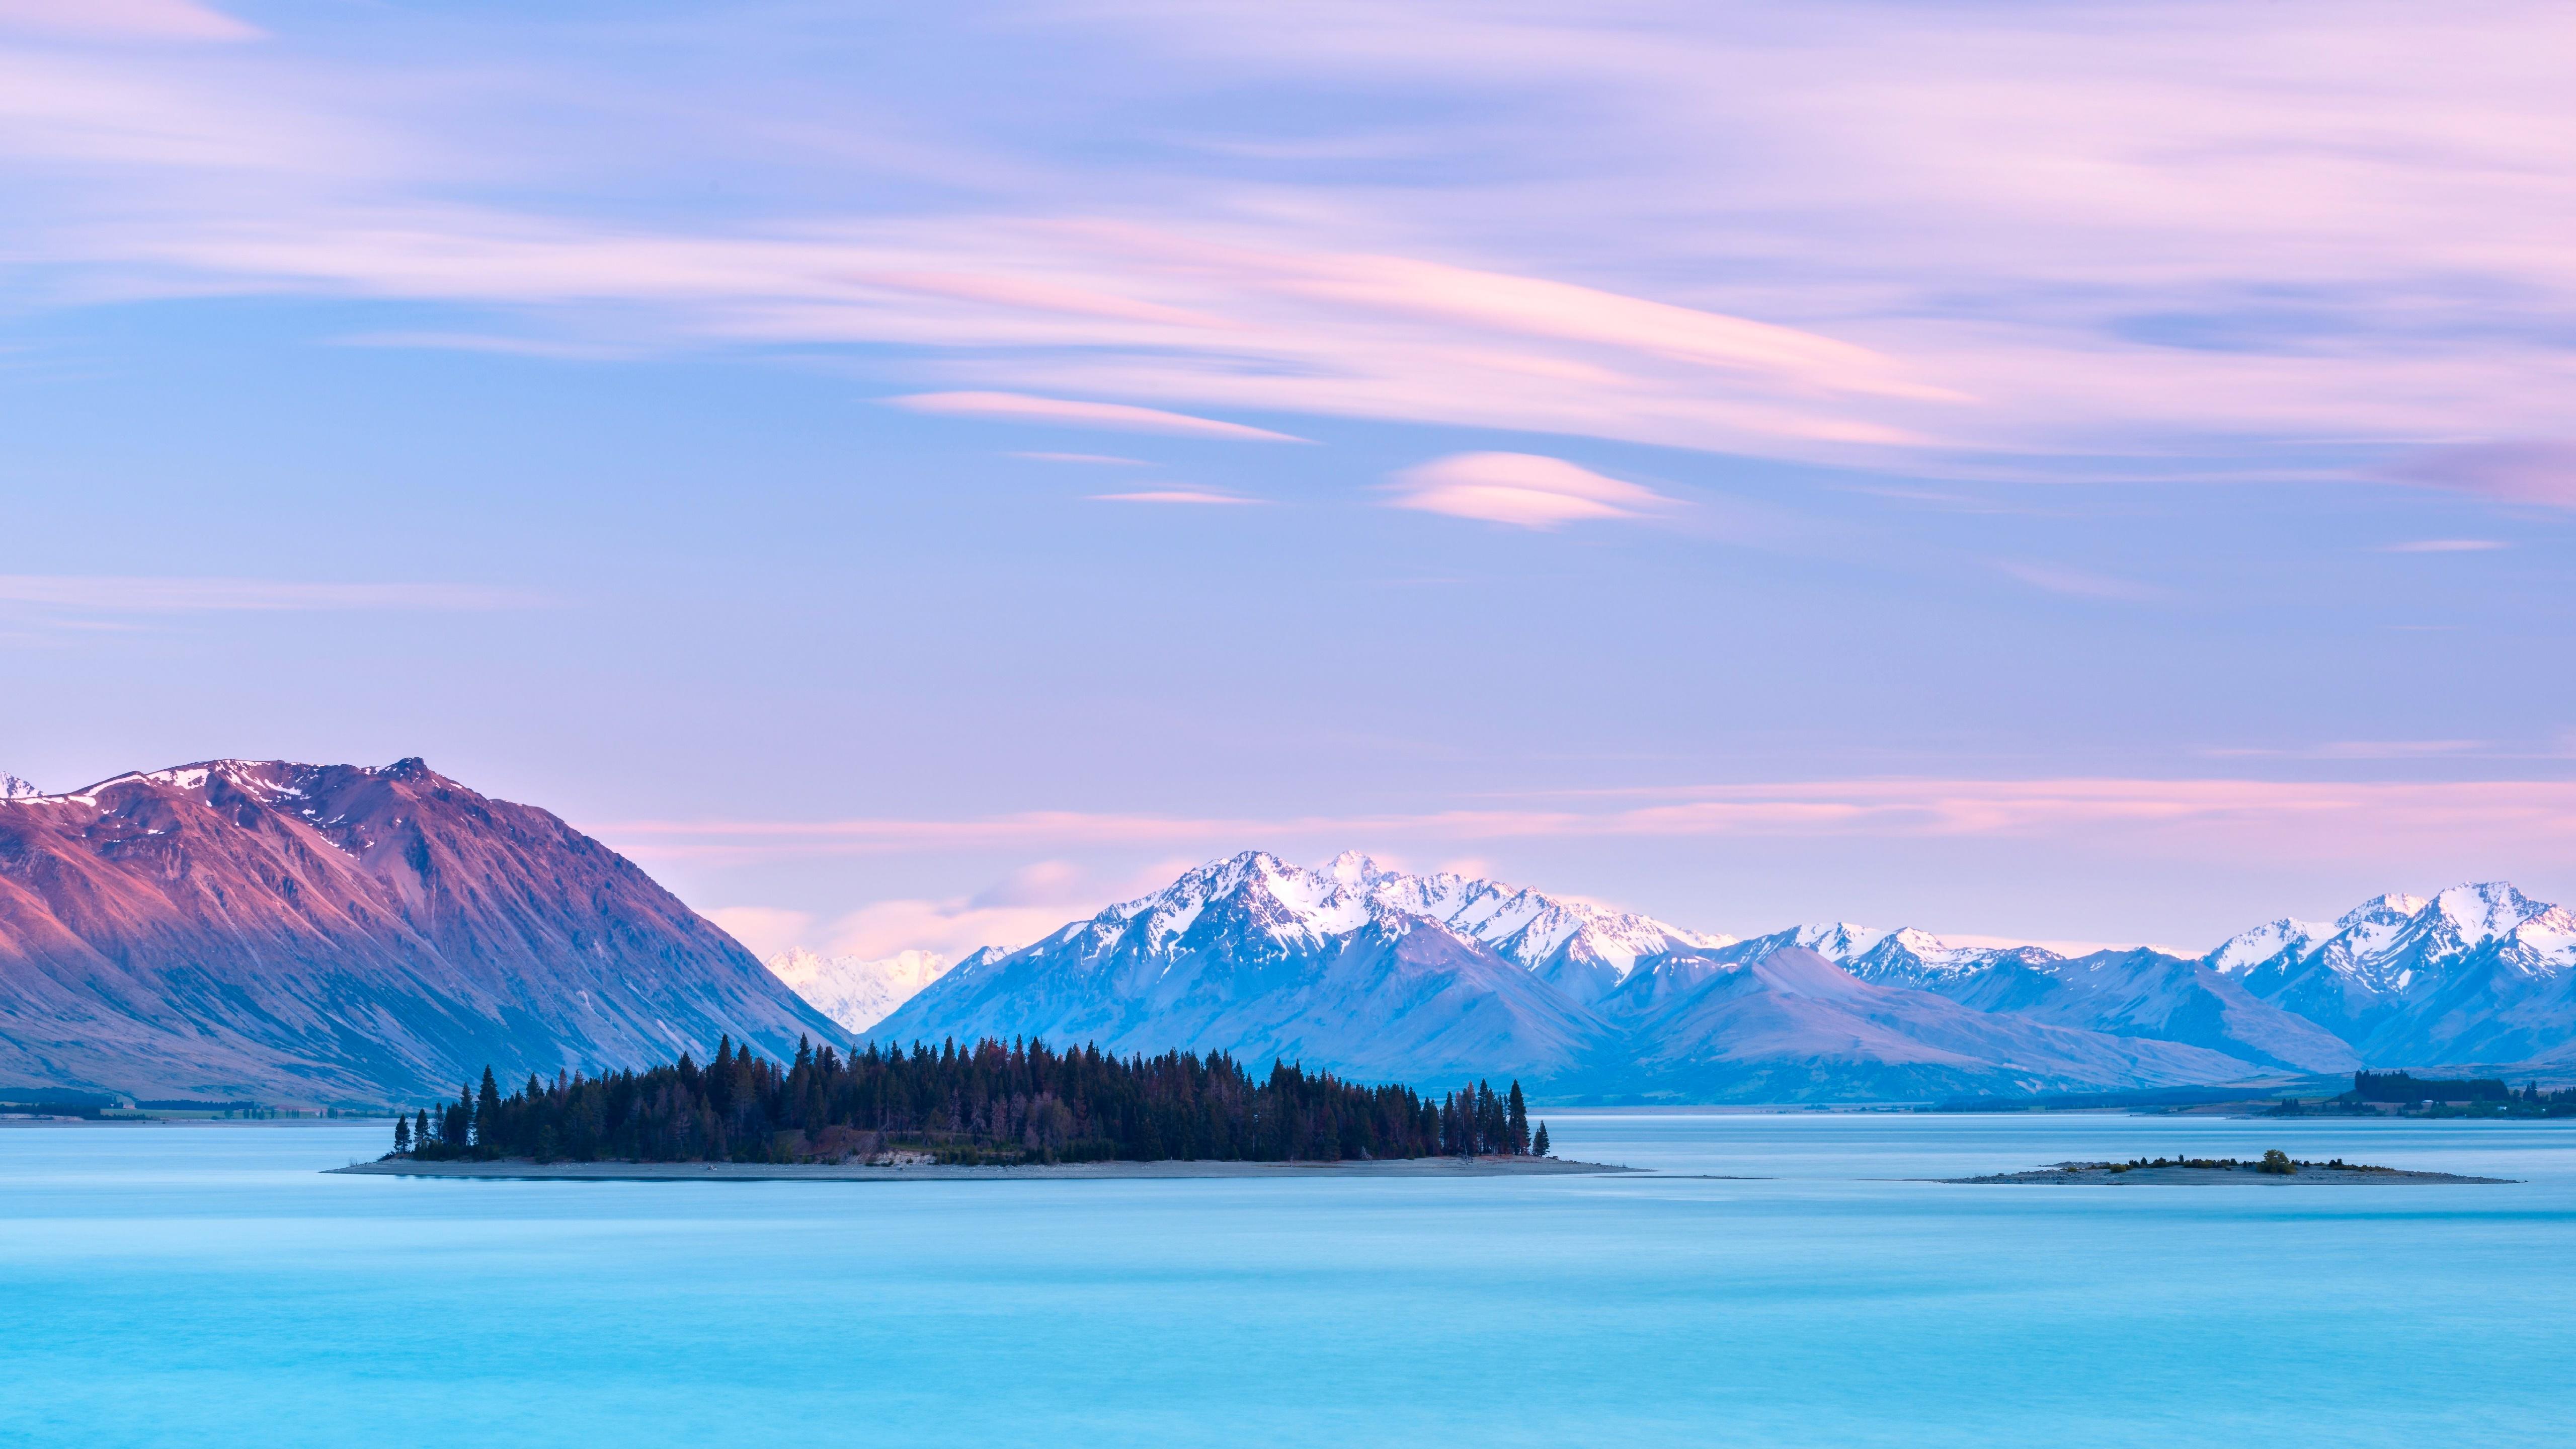 Motuariki Island on Lake Tekapo (New Zealand) wallpaper